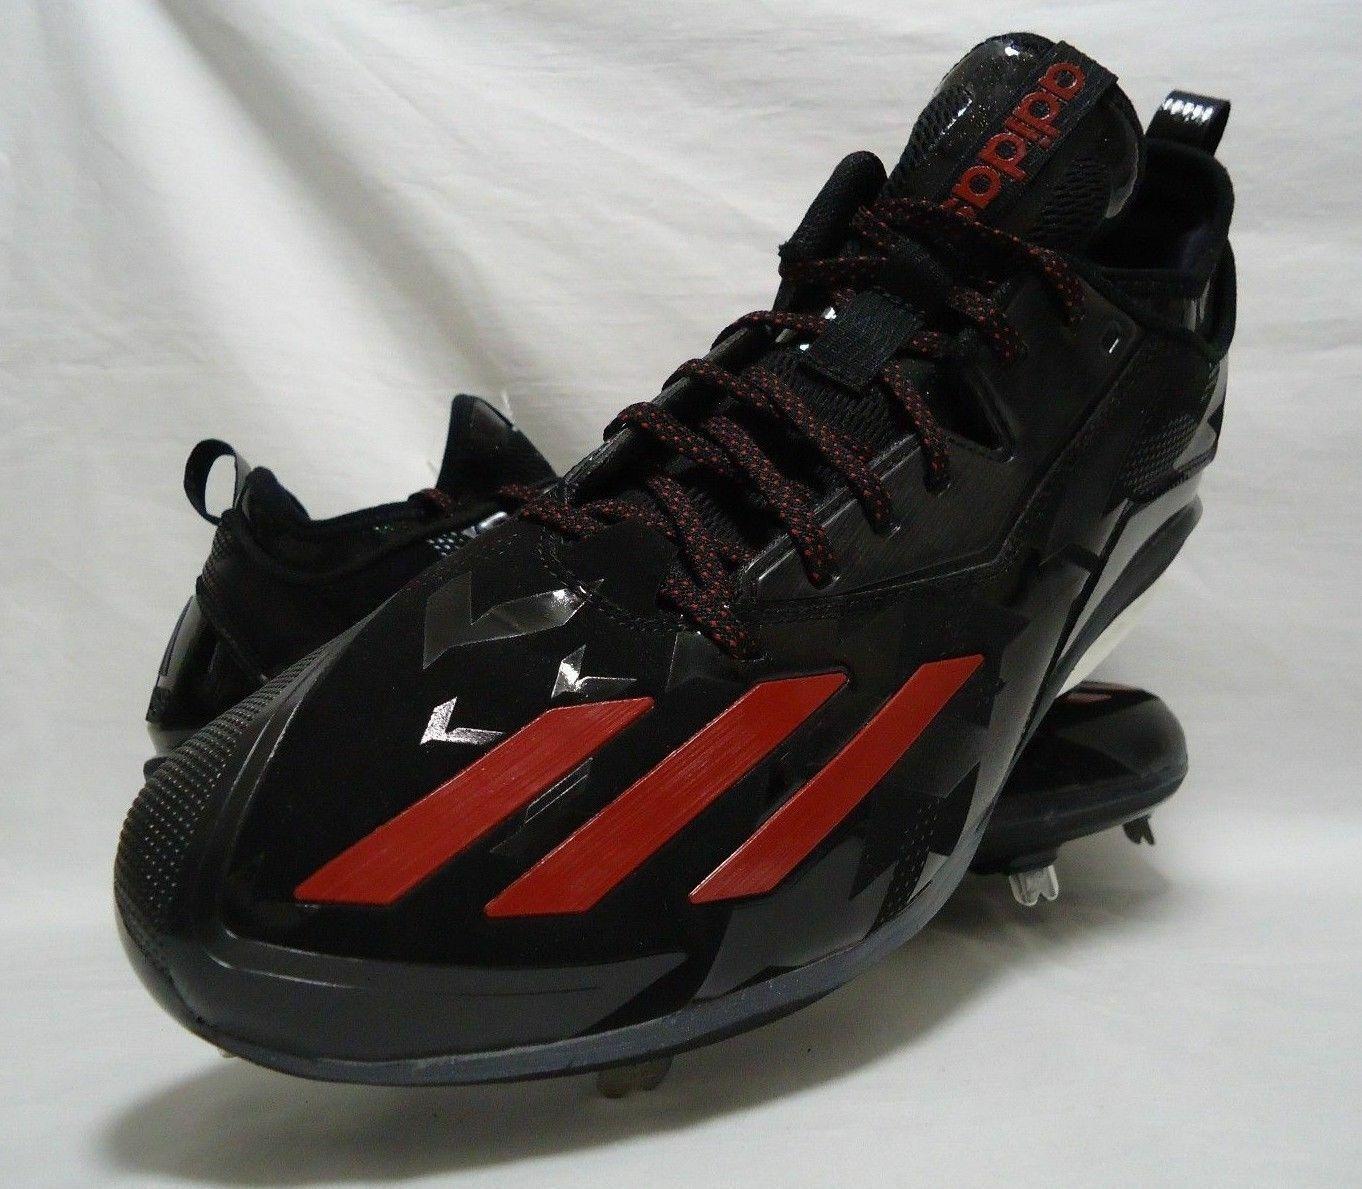 9ab138e62 Adidas Mens Baseball Cleats Size 13.5 Energy and 50 similar items. 57